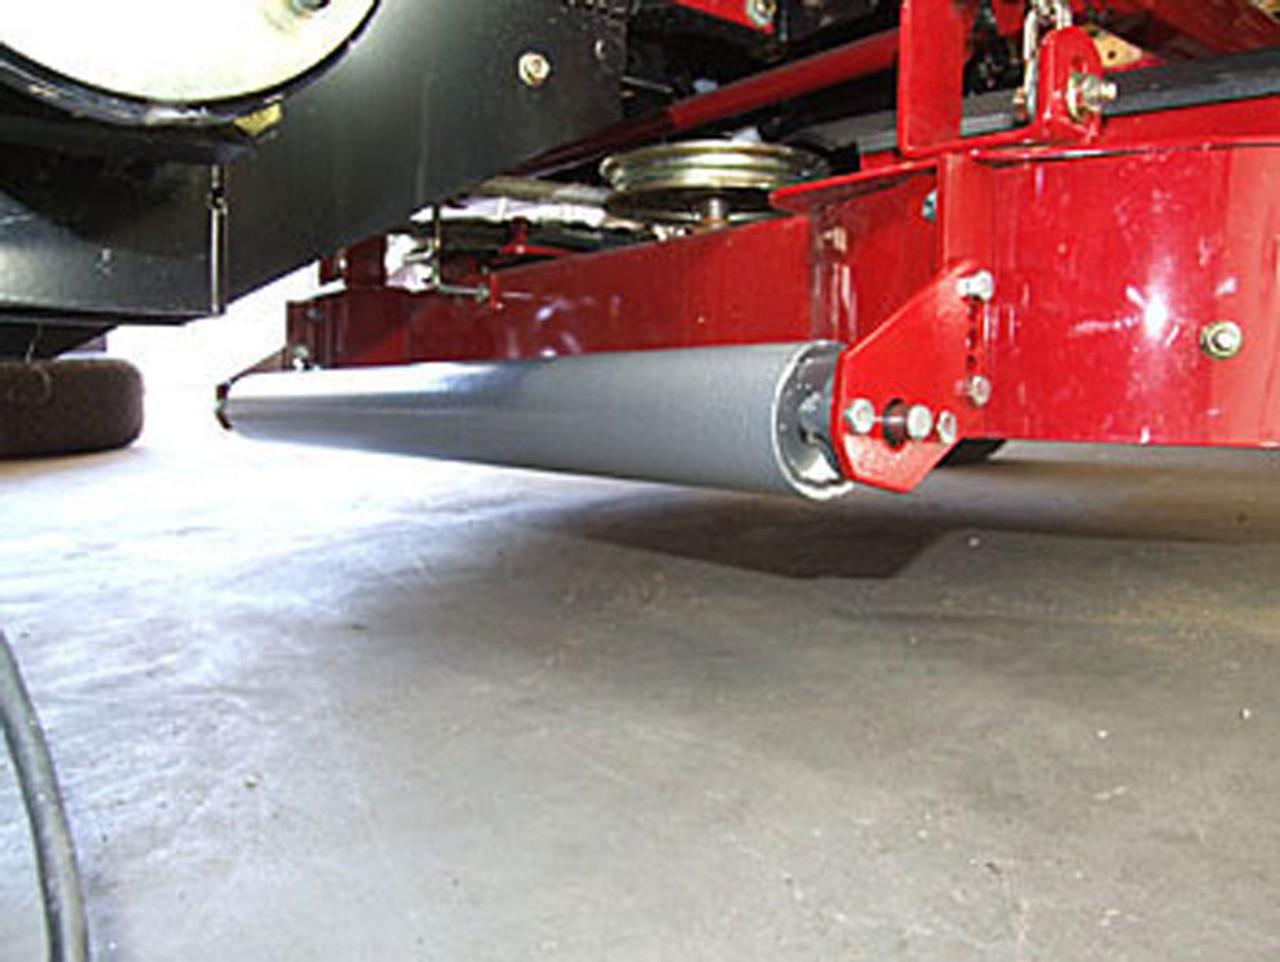 Installed lawn striper on Toro 400 series Estate zero turn mower.